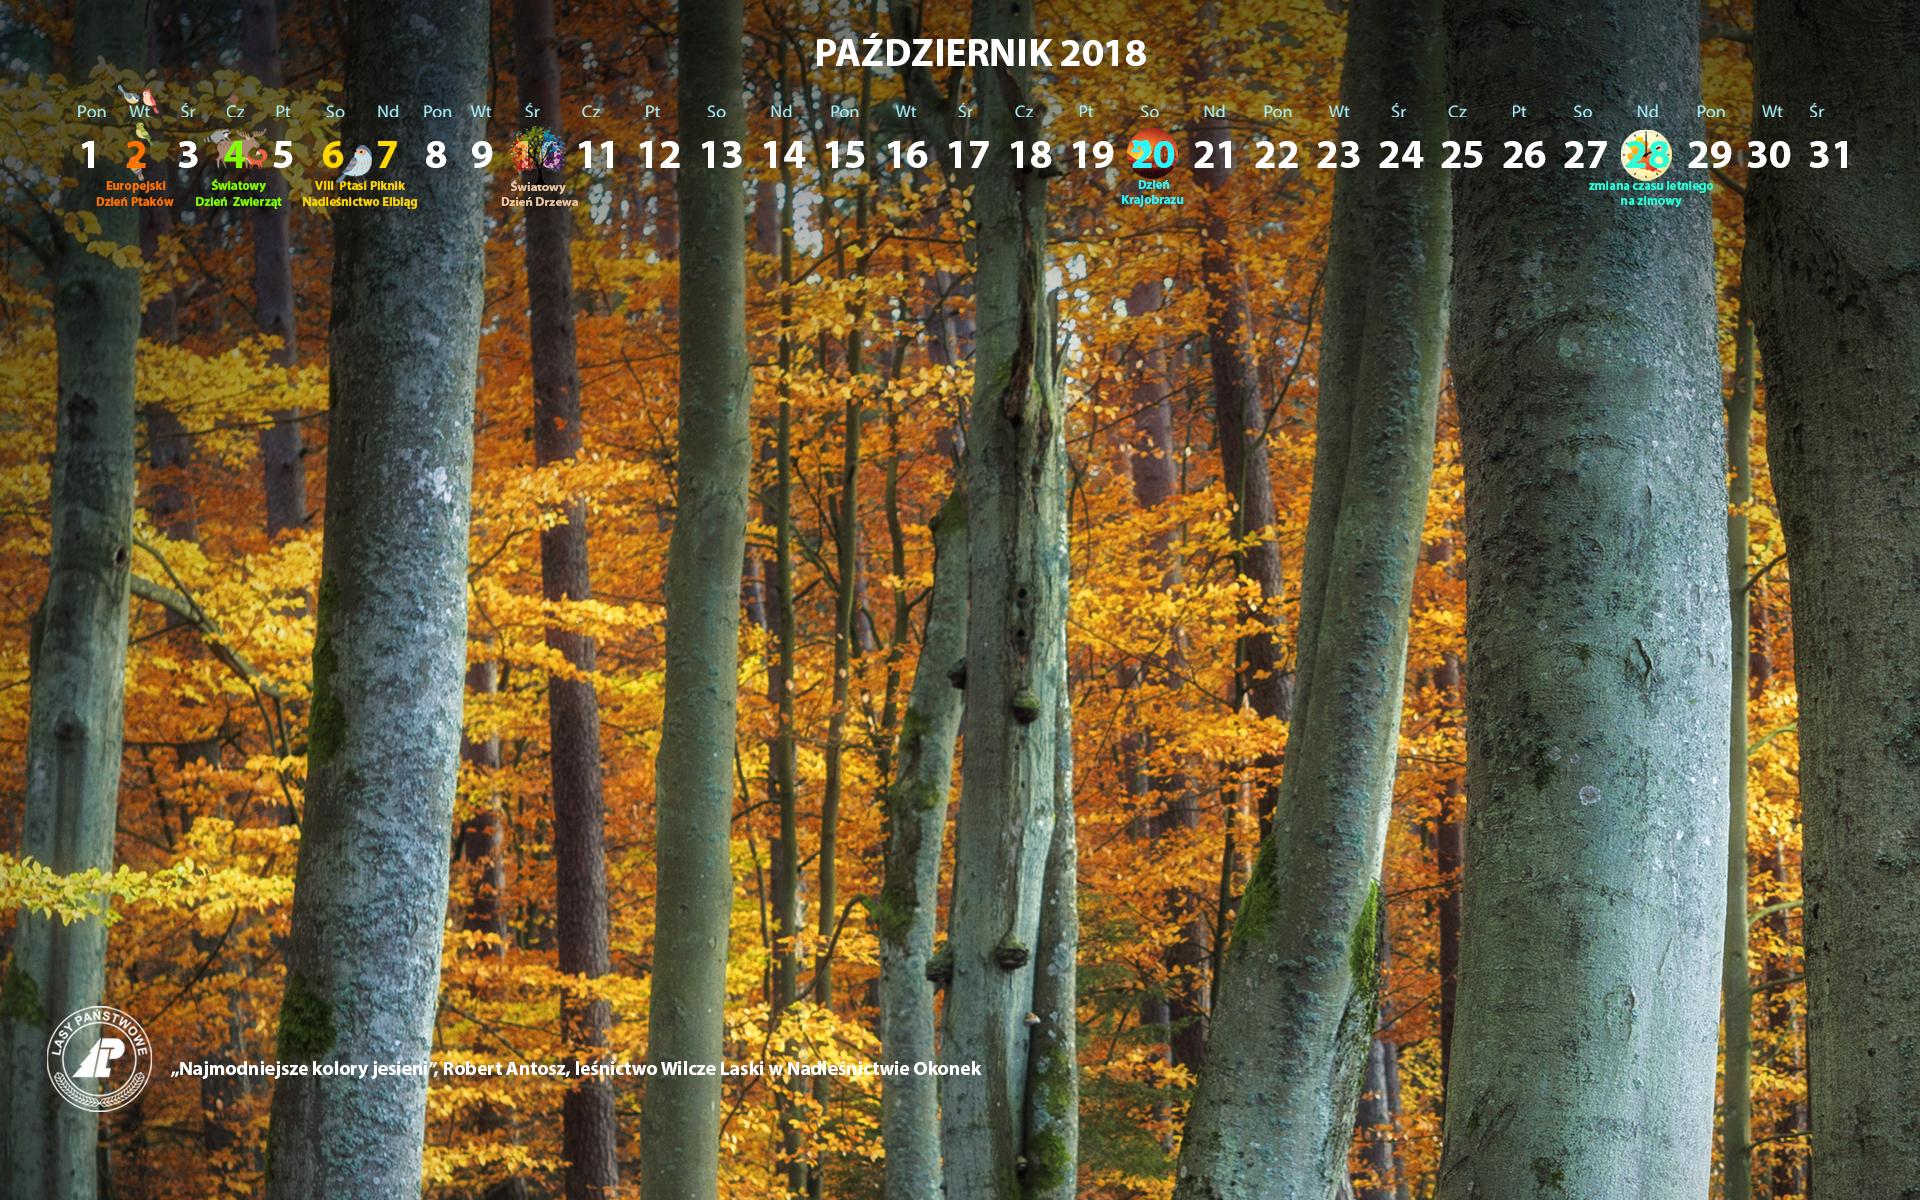 Kalendarz_październik_2018_1920x1200[1].jpg